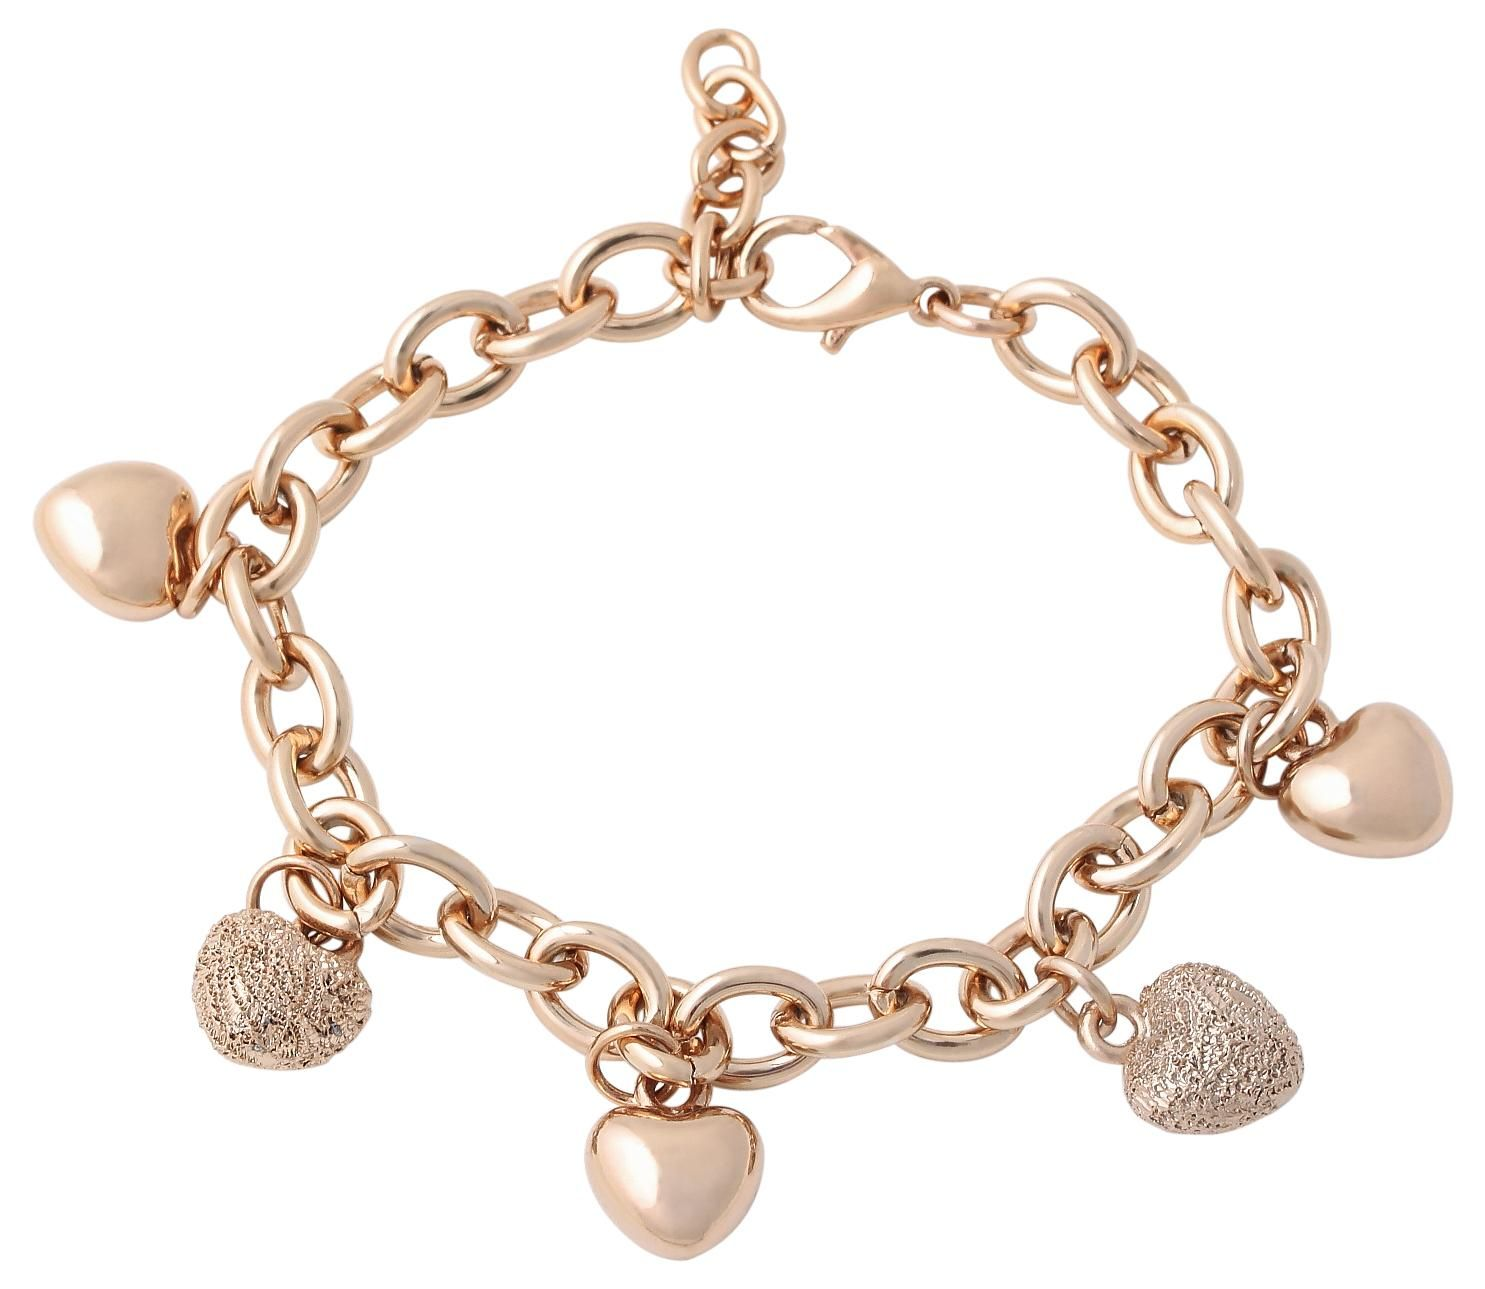 Modeschmuck armband gold  Braccialetto - rosegold | ACCESSORI MODA | Pinterest